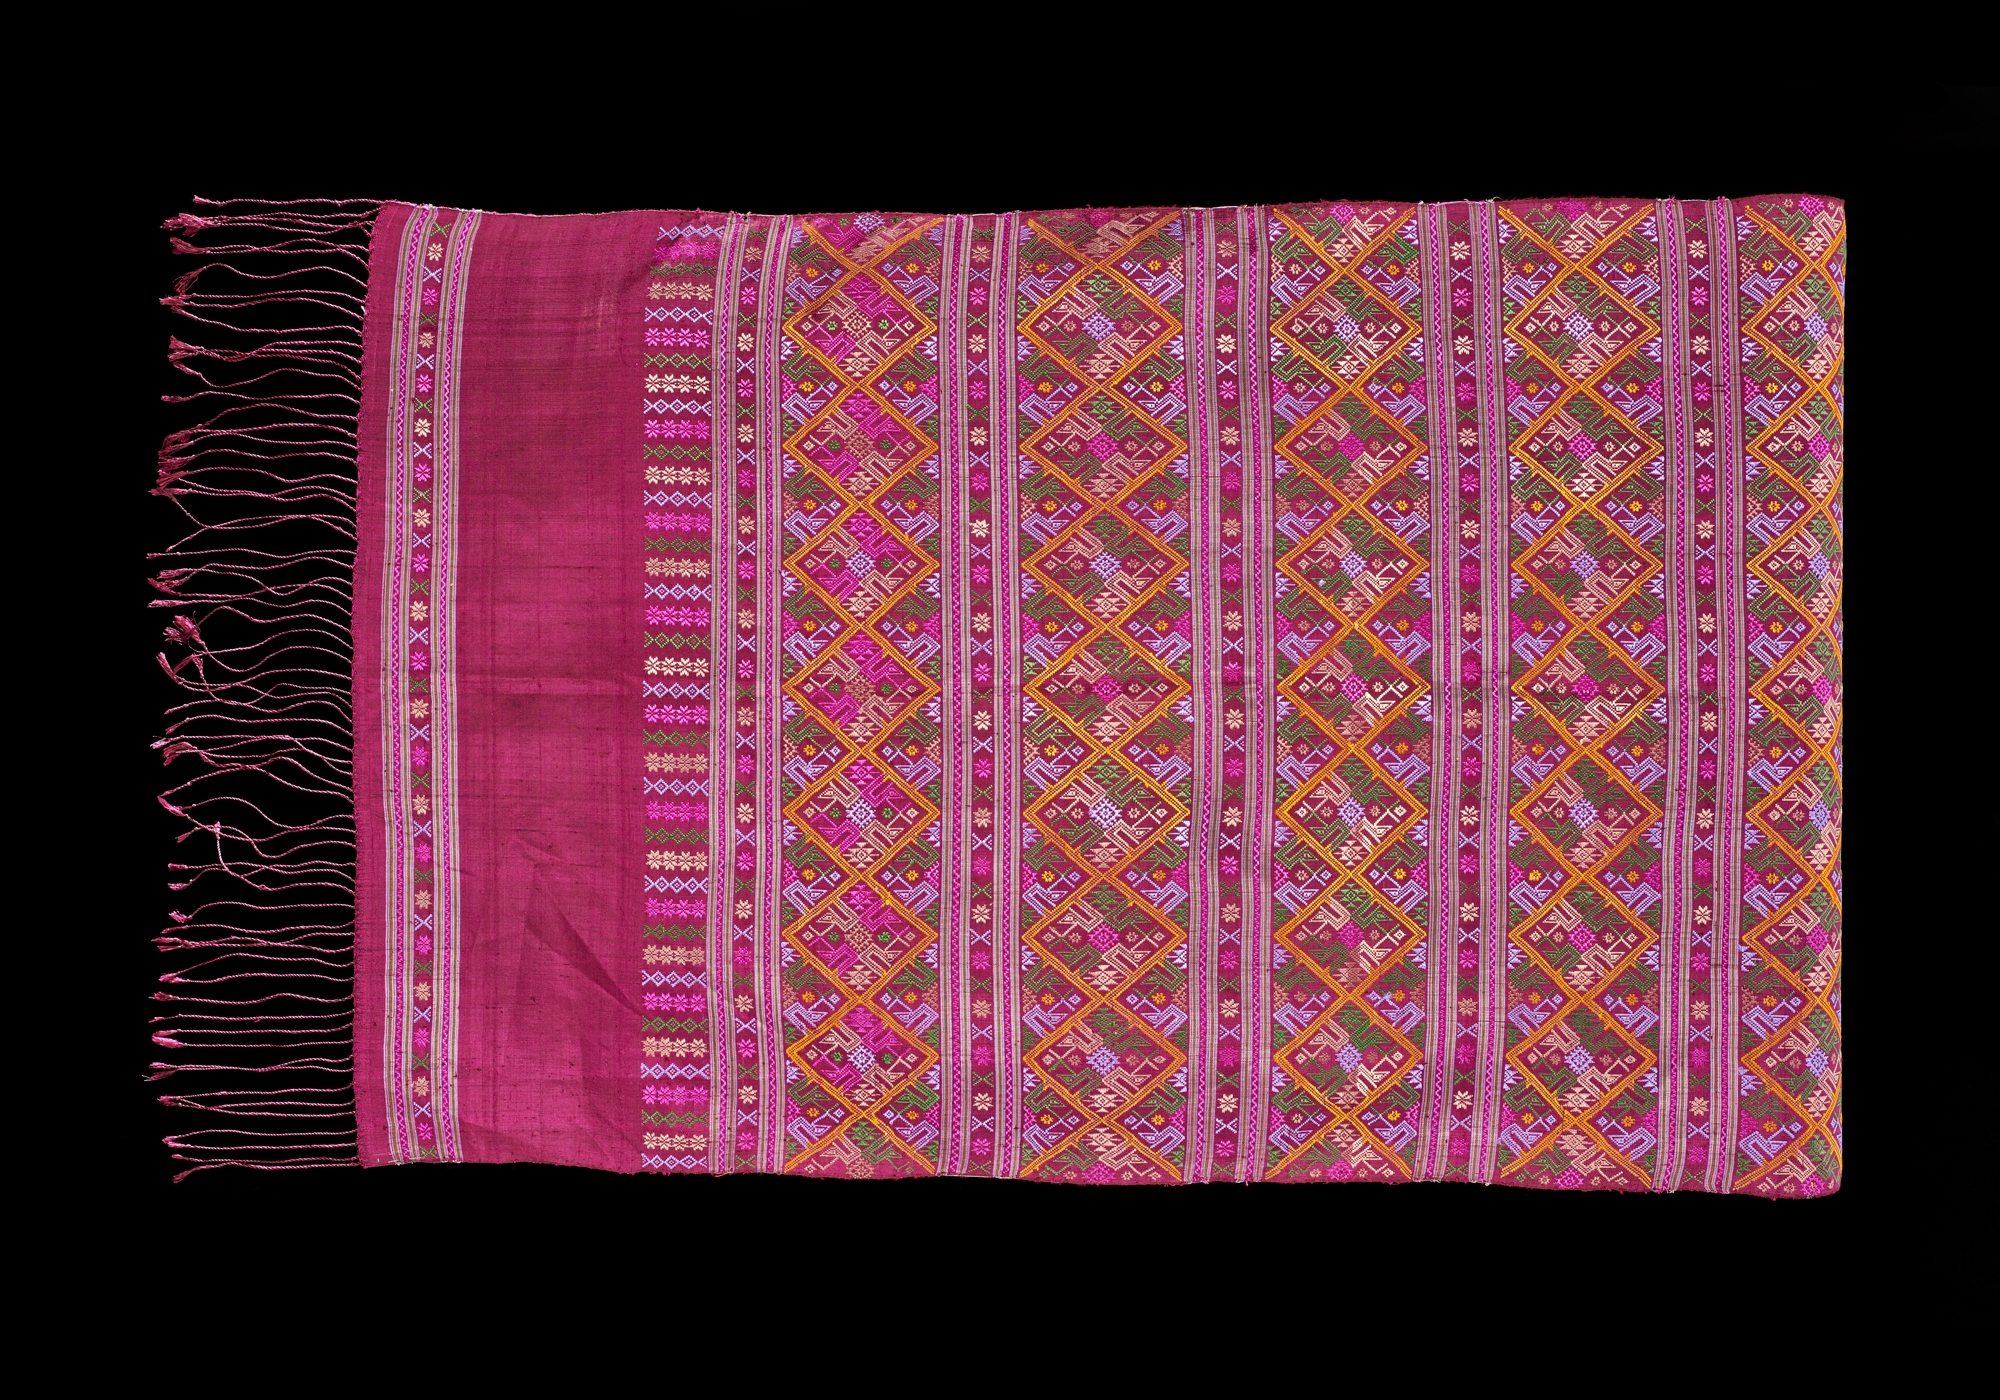 SUPPORT Foundation Praewa Silk Brocade Shoulder Cloth Gift from Queen Sirikit to President George H. W. Bush and First Lady Barbara Bush, 1991 Courtesy of the George Bush Presidential Library and Museum; 91.70108.6  ผ้าแพรวาคลุมไหล่จากมูลนิธิส่งเสริมศิลปาชีพฯ ของขวัญพระราชทานจากสมเด็จพระนางเจ้าสิริกิติ์ พระบรมราชินีนาถ แก่ประธานาธิบดีจอร์จ เอช. ดับเบิลยู. บุช และนางบาร์บารา บุช สุภาพสตรีหมายเลขหนึ่ง พ.ศ. ๒๕๓๔ ได้รับความอนุเคราะห์จากพิพิธภัณฑ์และหอสมุดประธานาธิบดีจอร์จ บุช; 91.70108.6